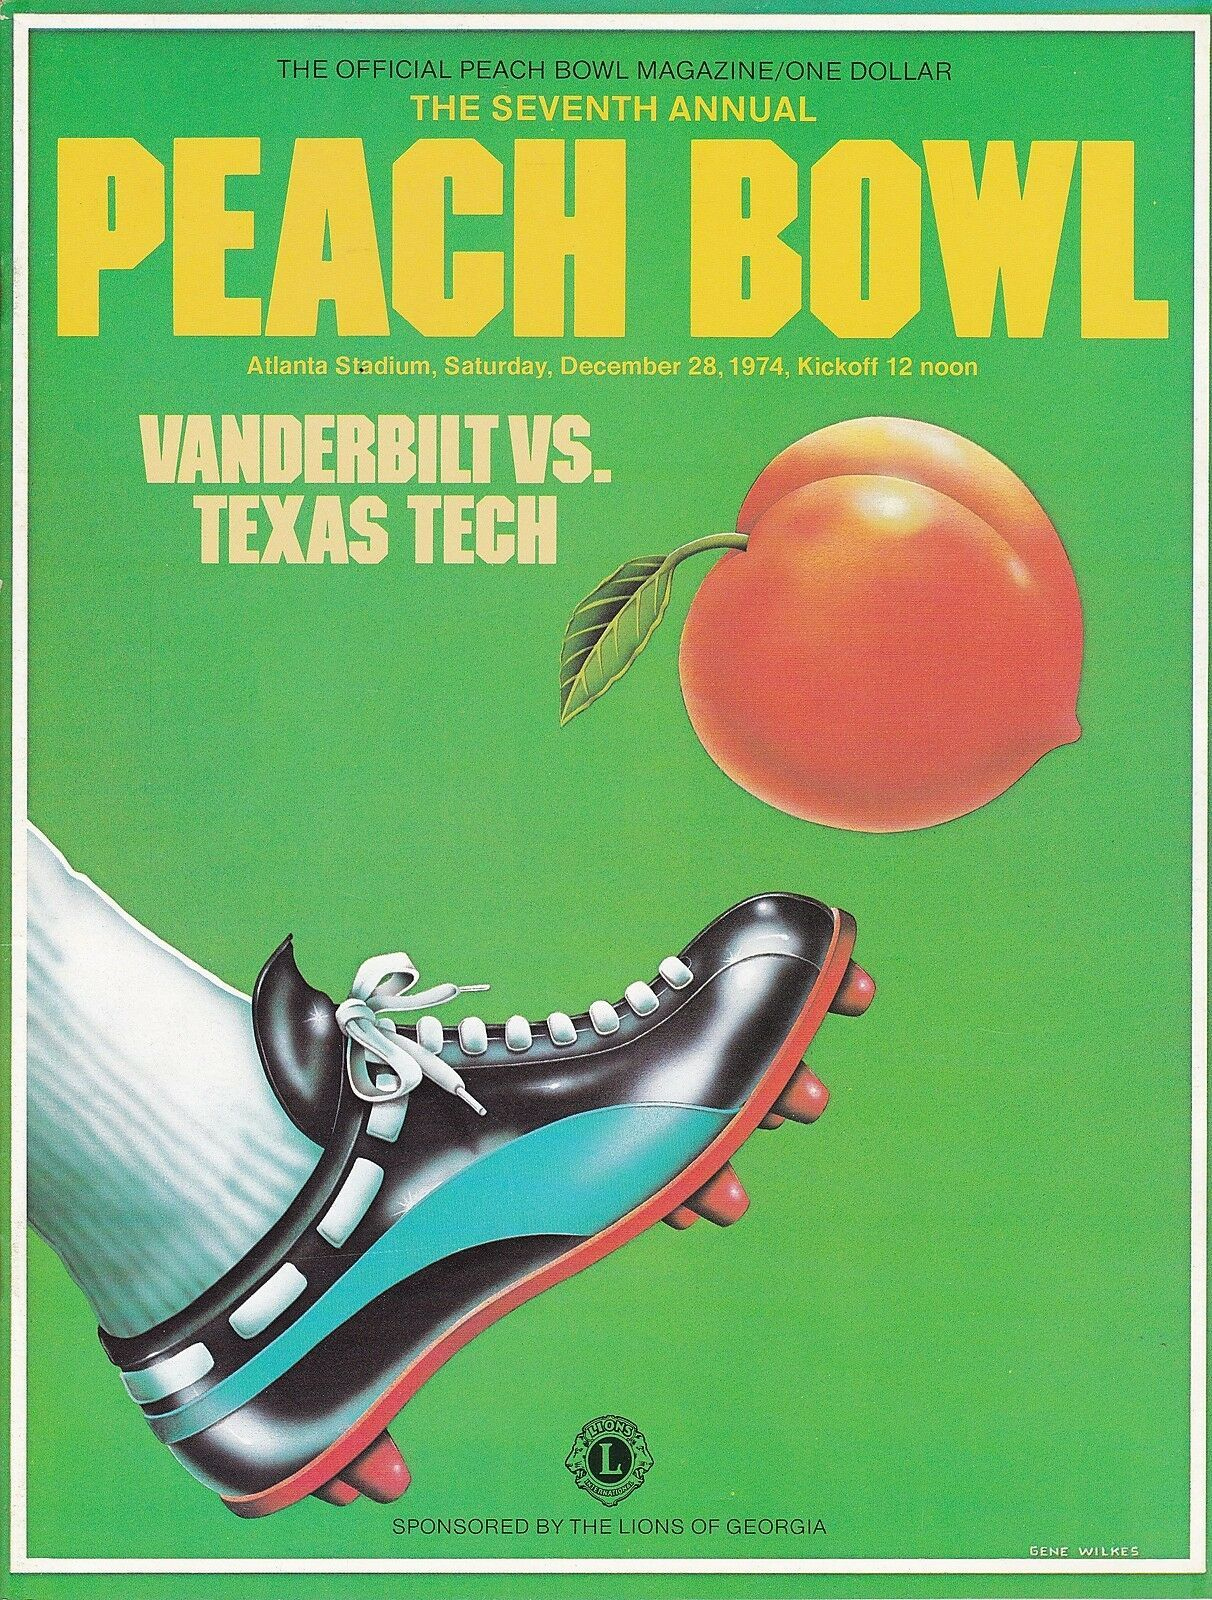 Vanderbilt vs Texas Tech 1974 Peach Bowl college football